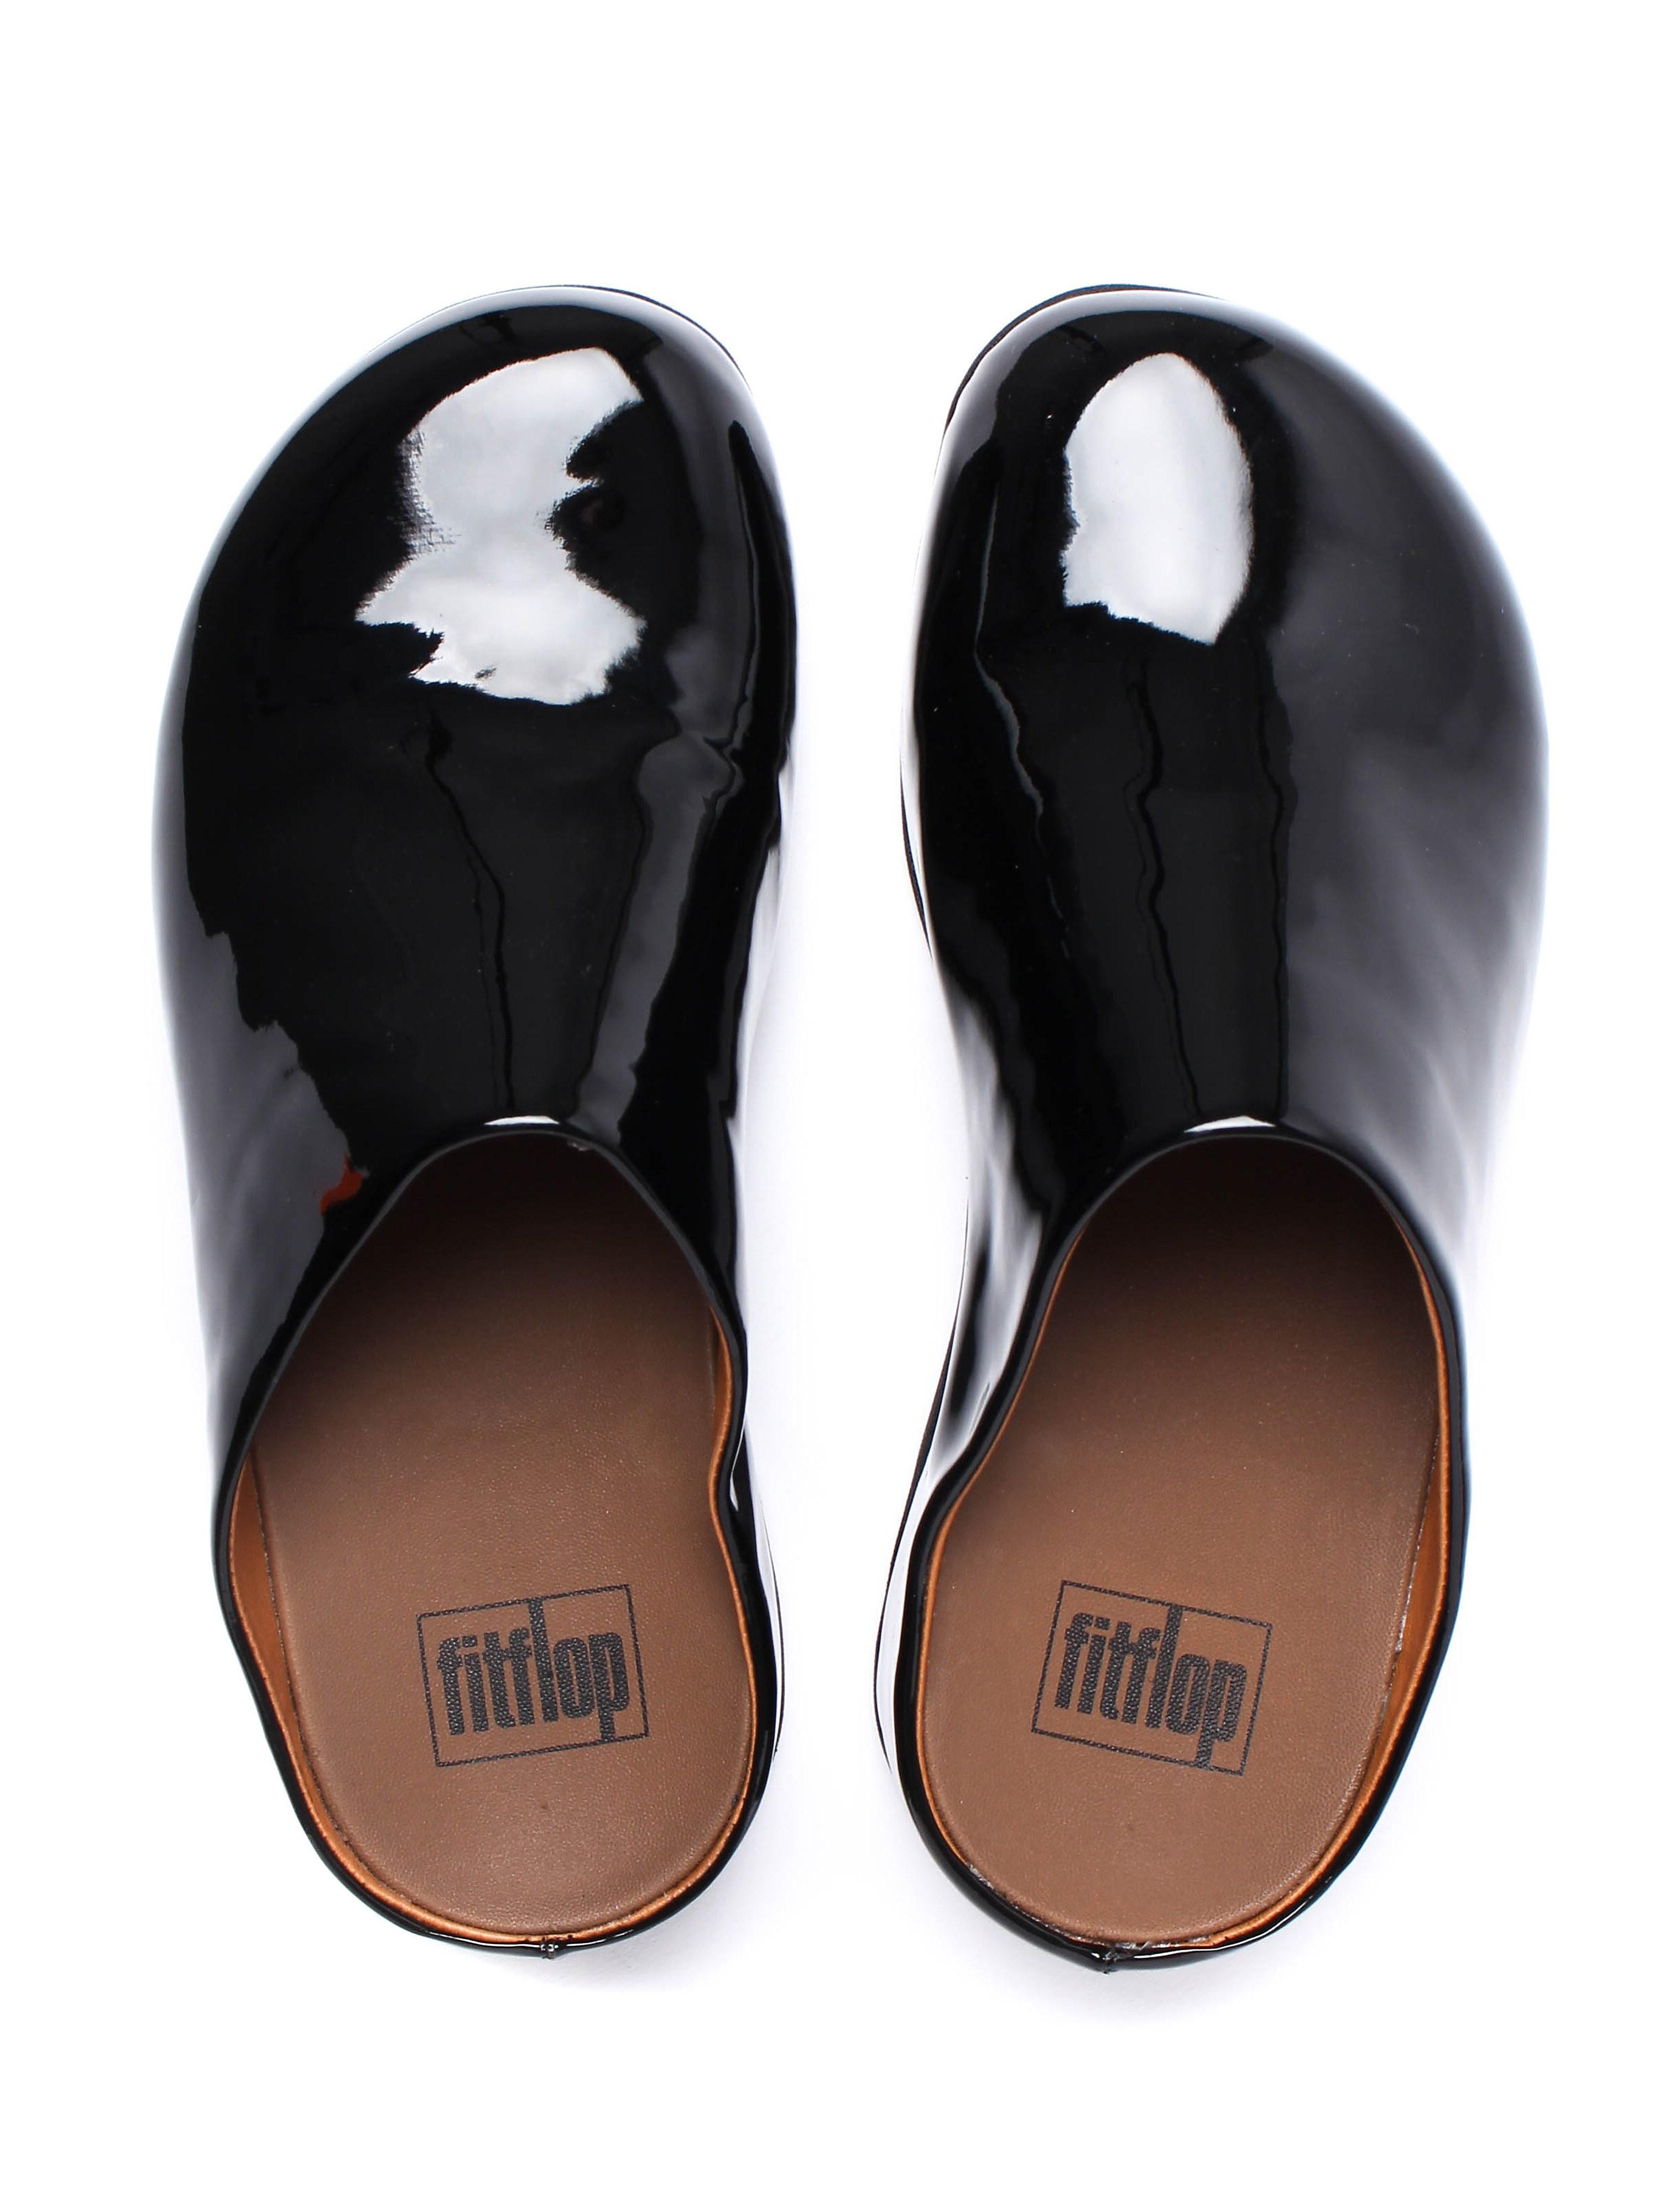 FitFlop Women's Shuv Patent Slip-On Shoe - Black